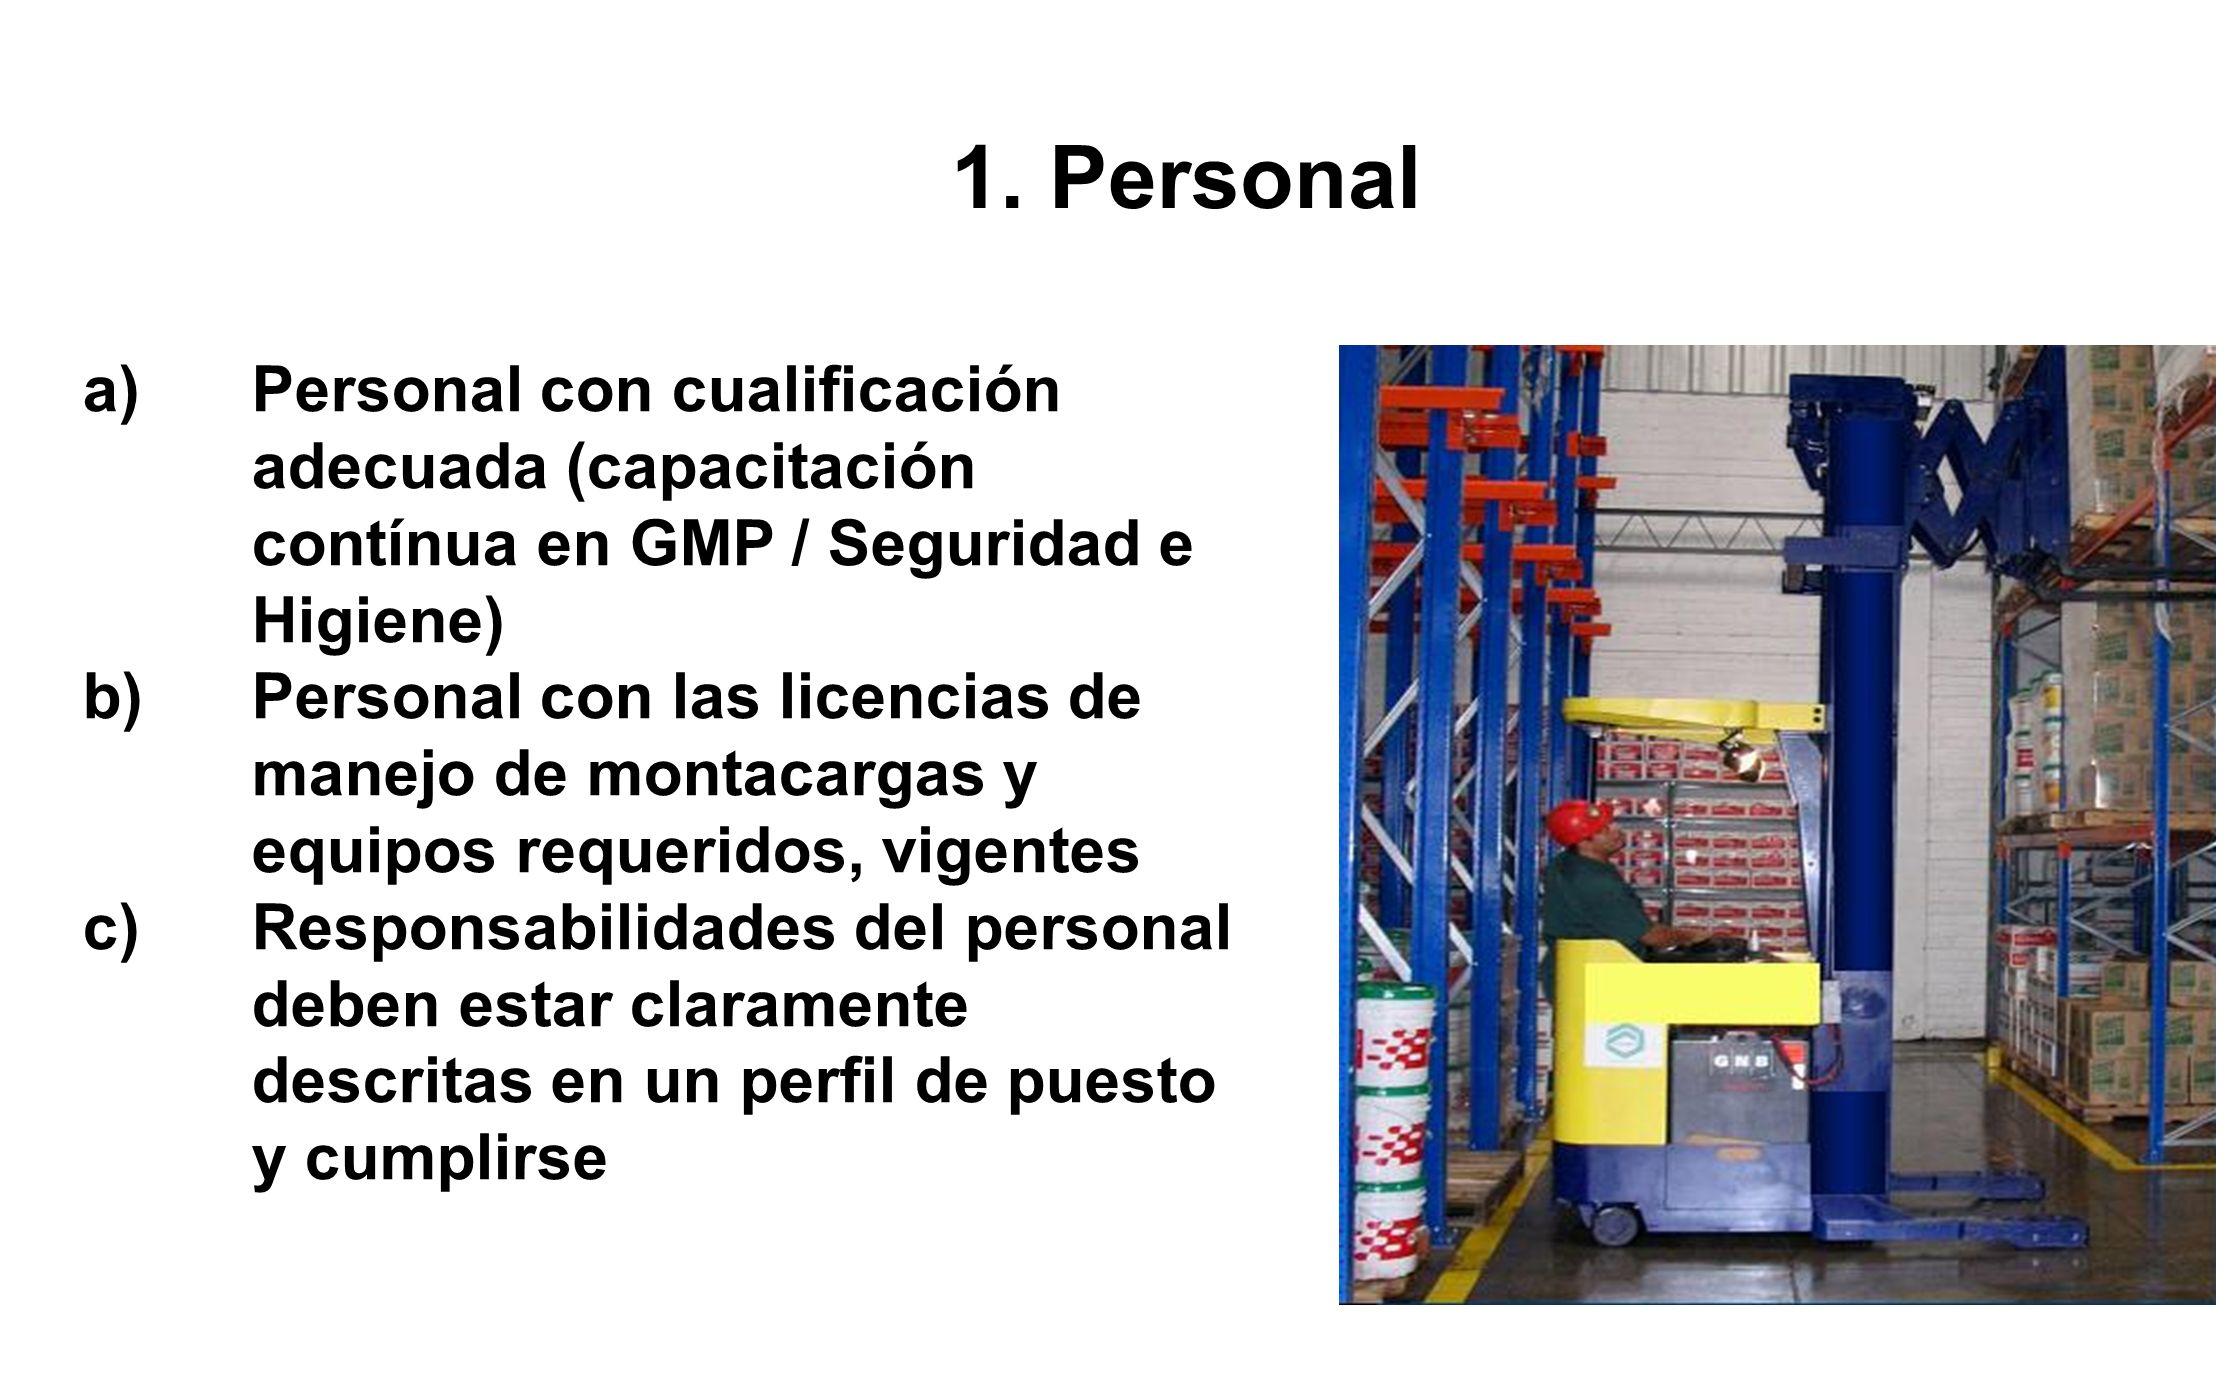 1. Personal Personal con cualificación adecuada (capacitación contínua en GMP / Seguridad e Higiene)